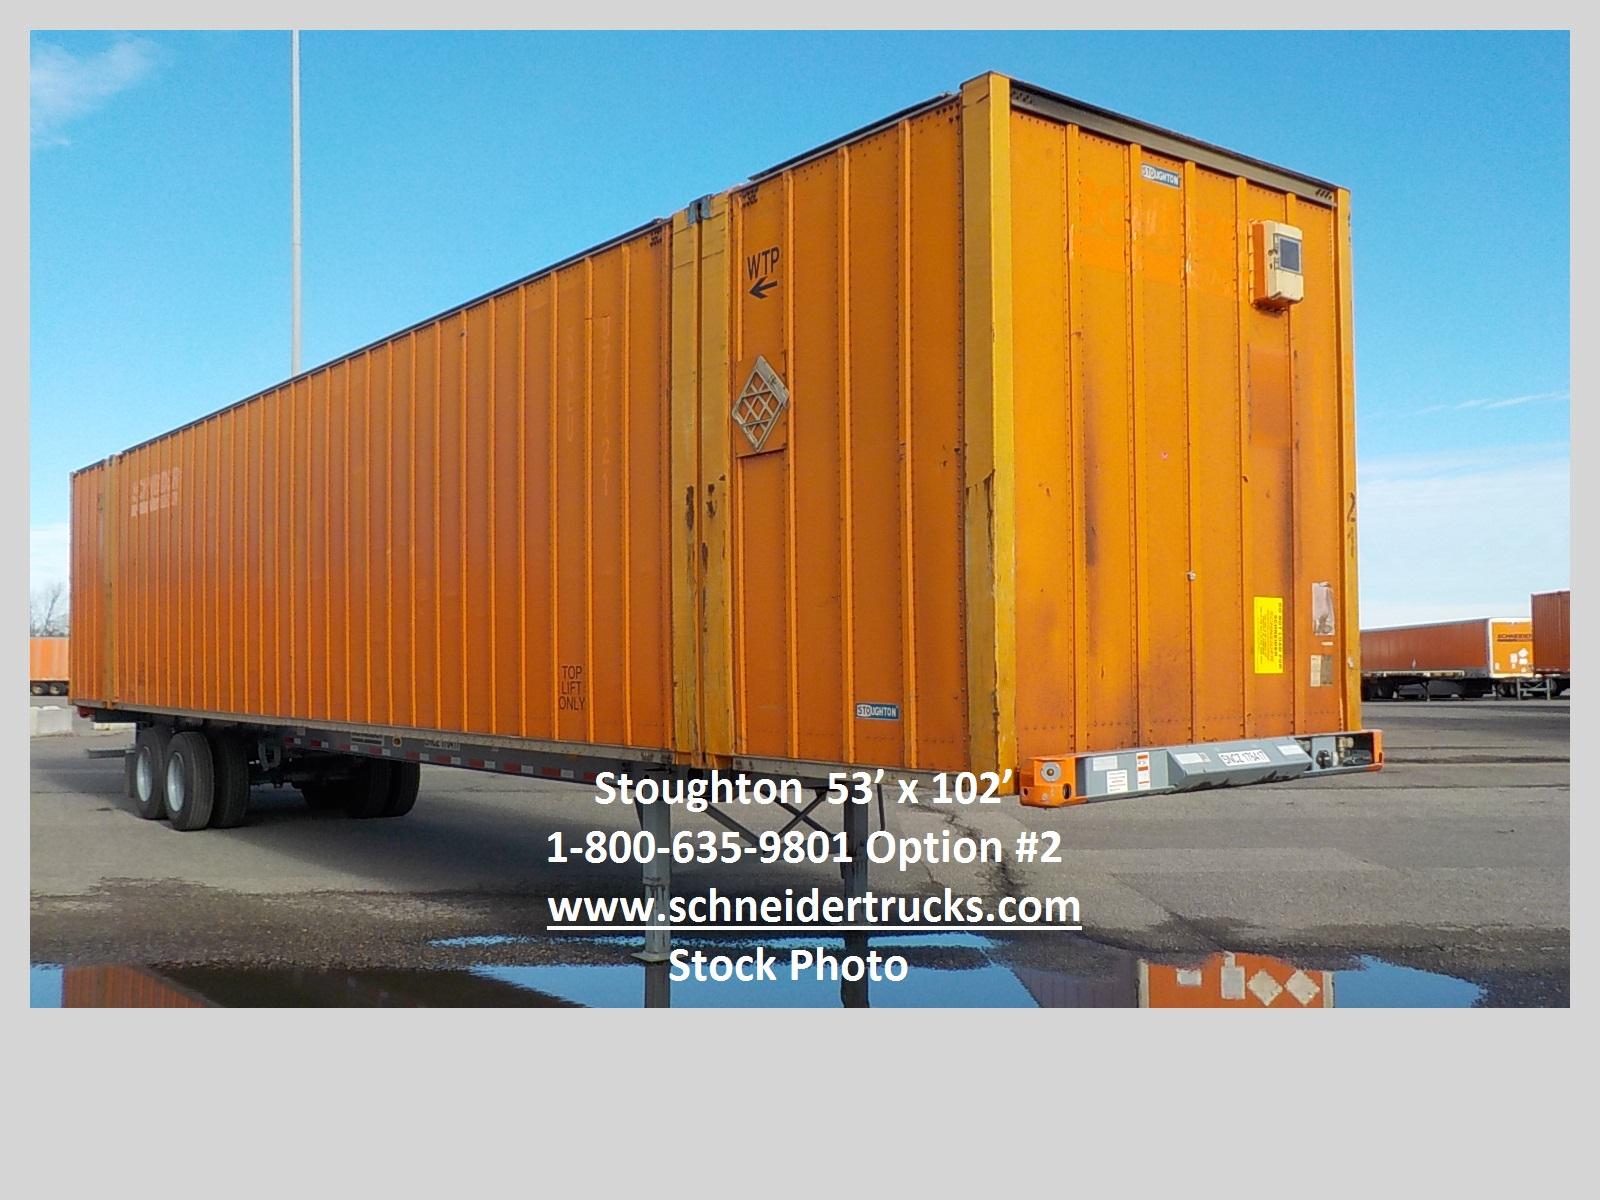 2007 Stoughton container